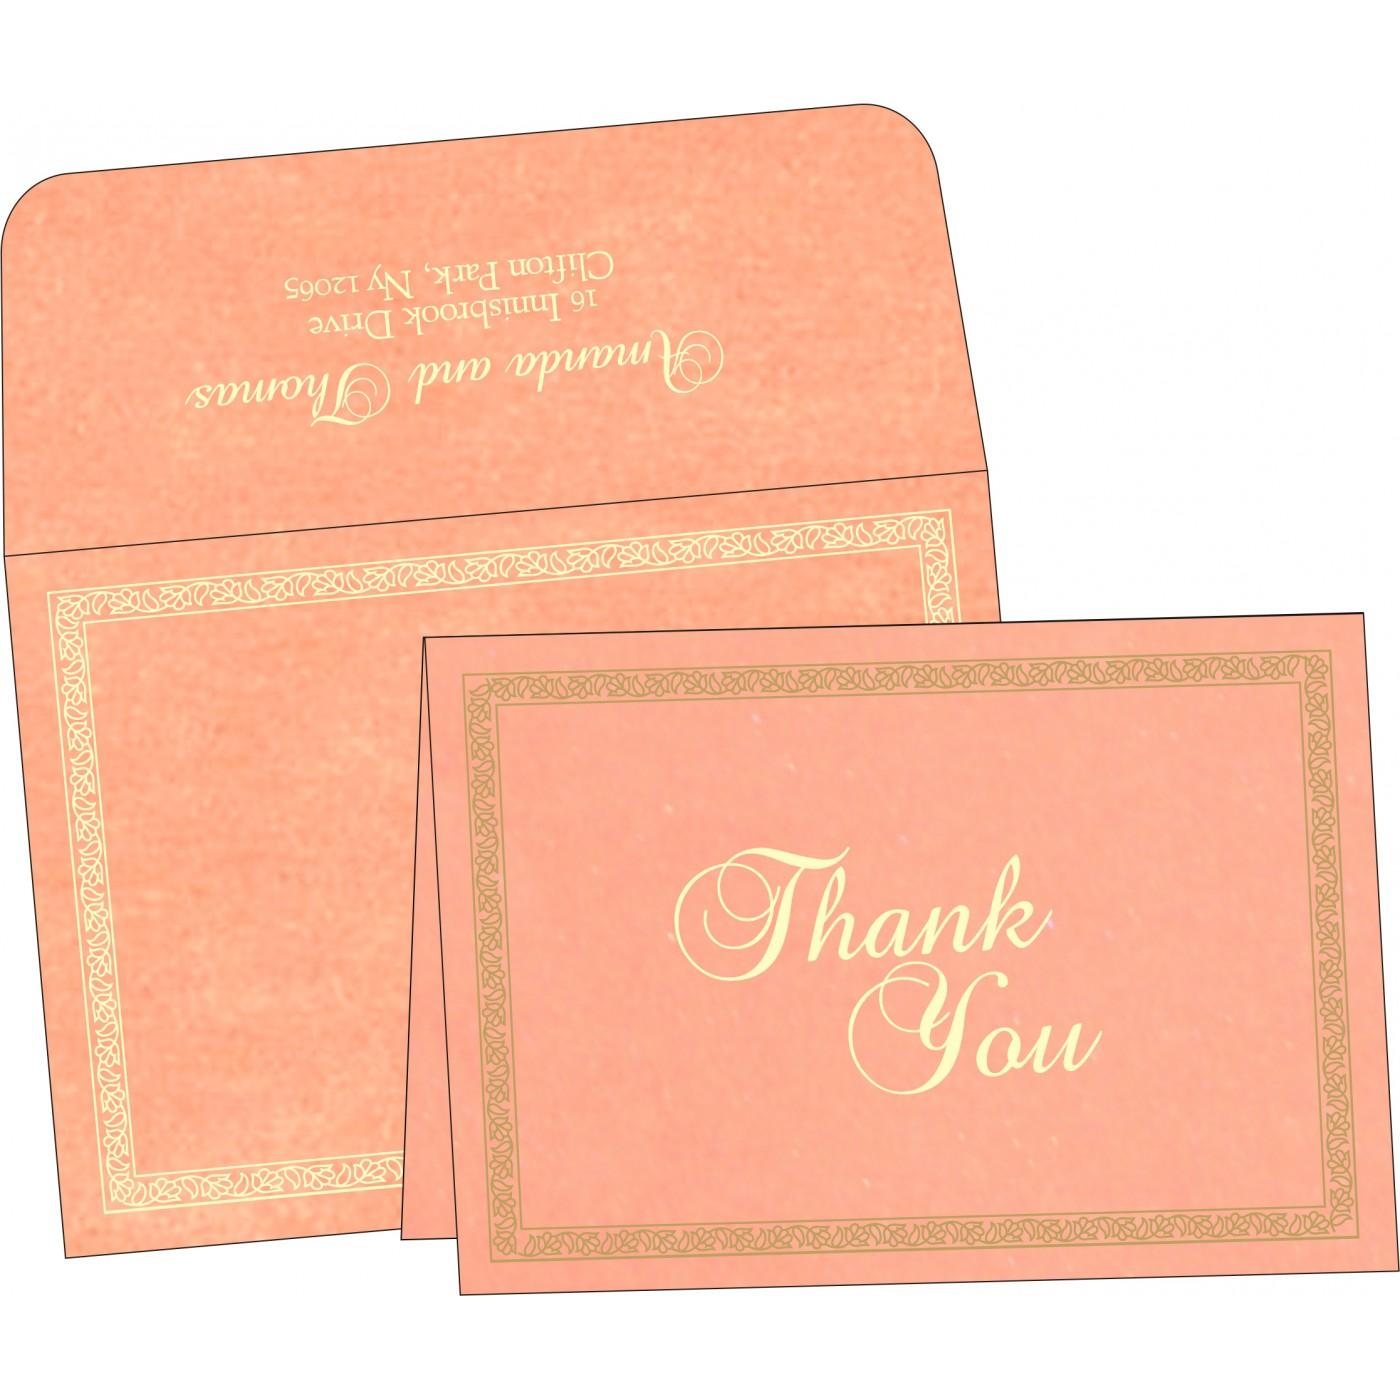 Thank You Cards : TYC-8211J - 123WeddingCards